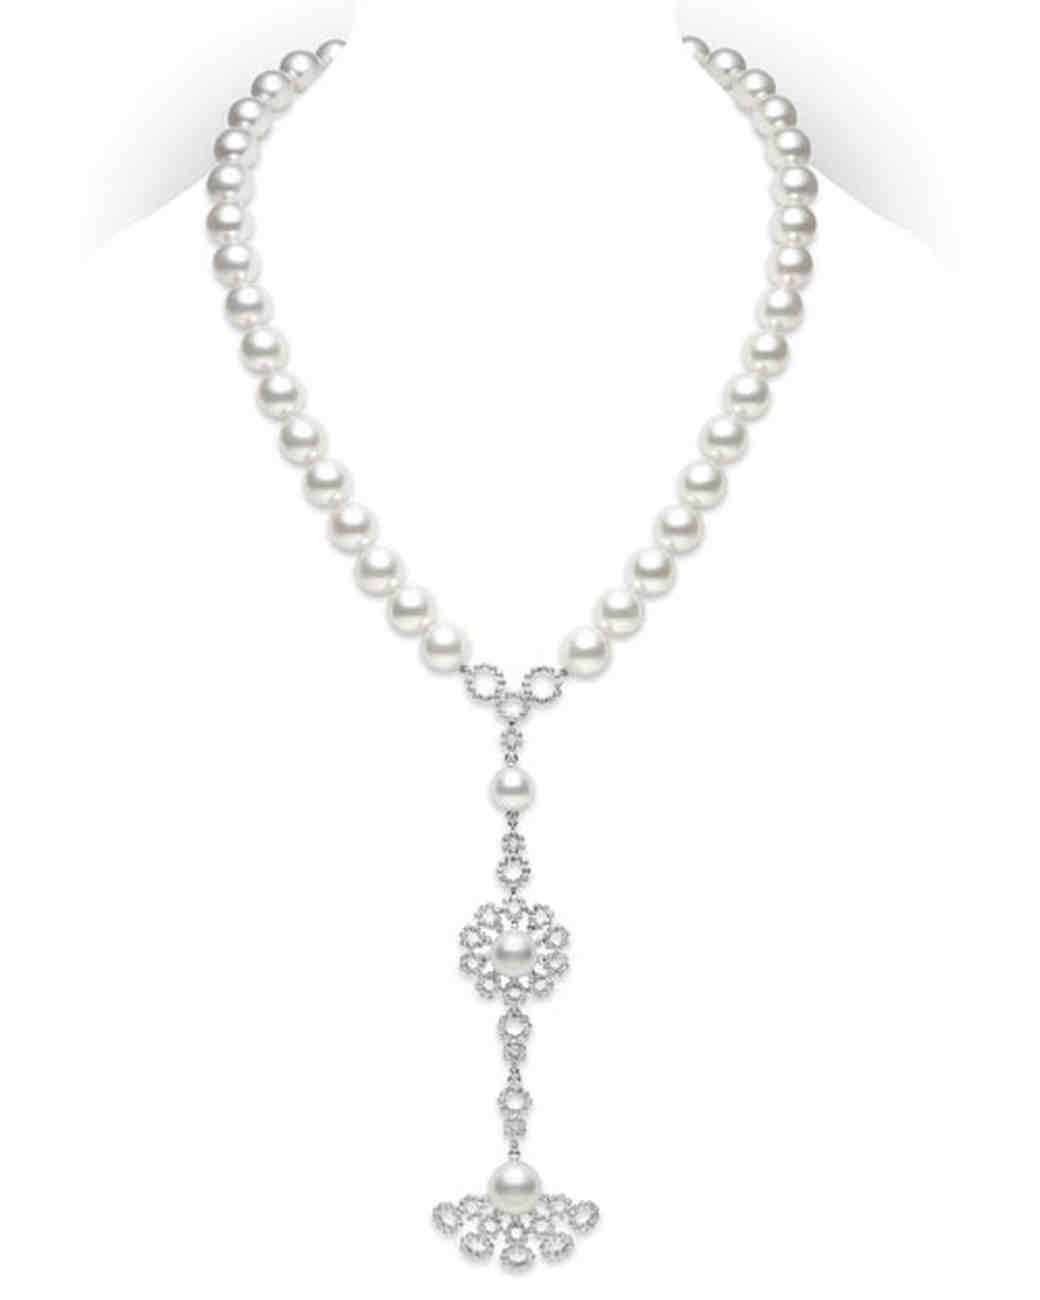 mikimoto_uz2277ndw_necklace.jpg